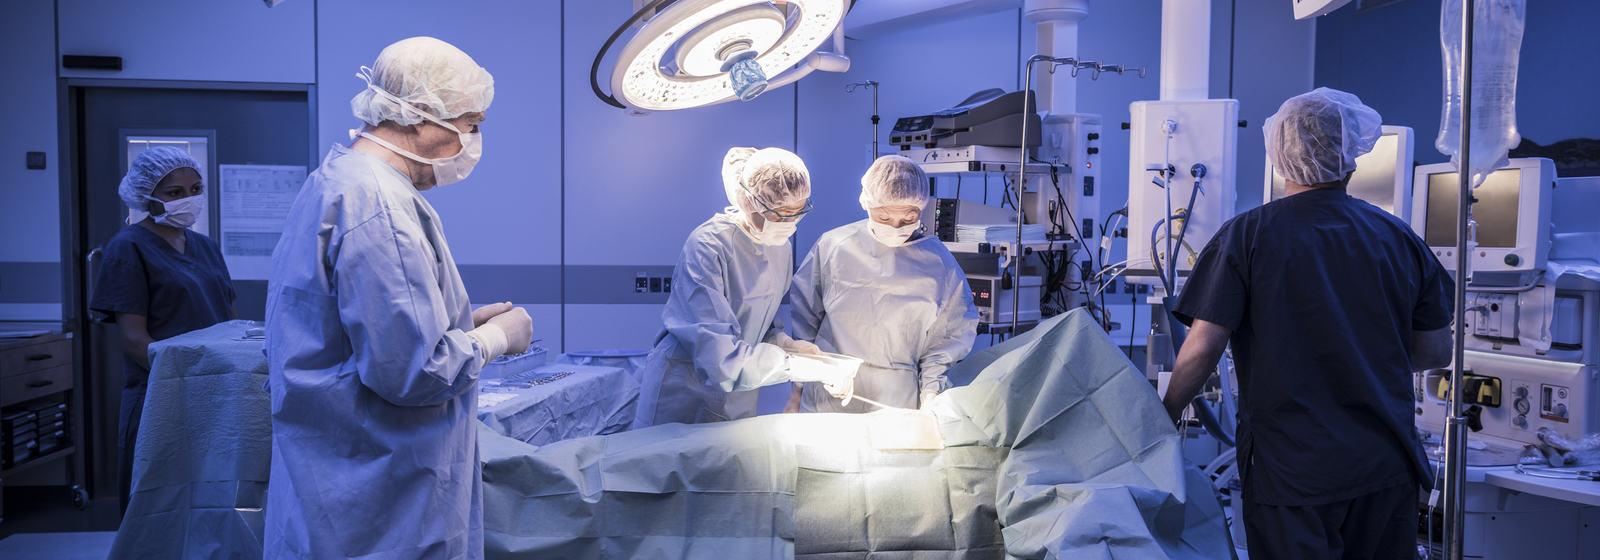 Free Online Course: Perioperative Medicine in Action